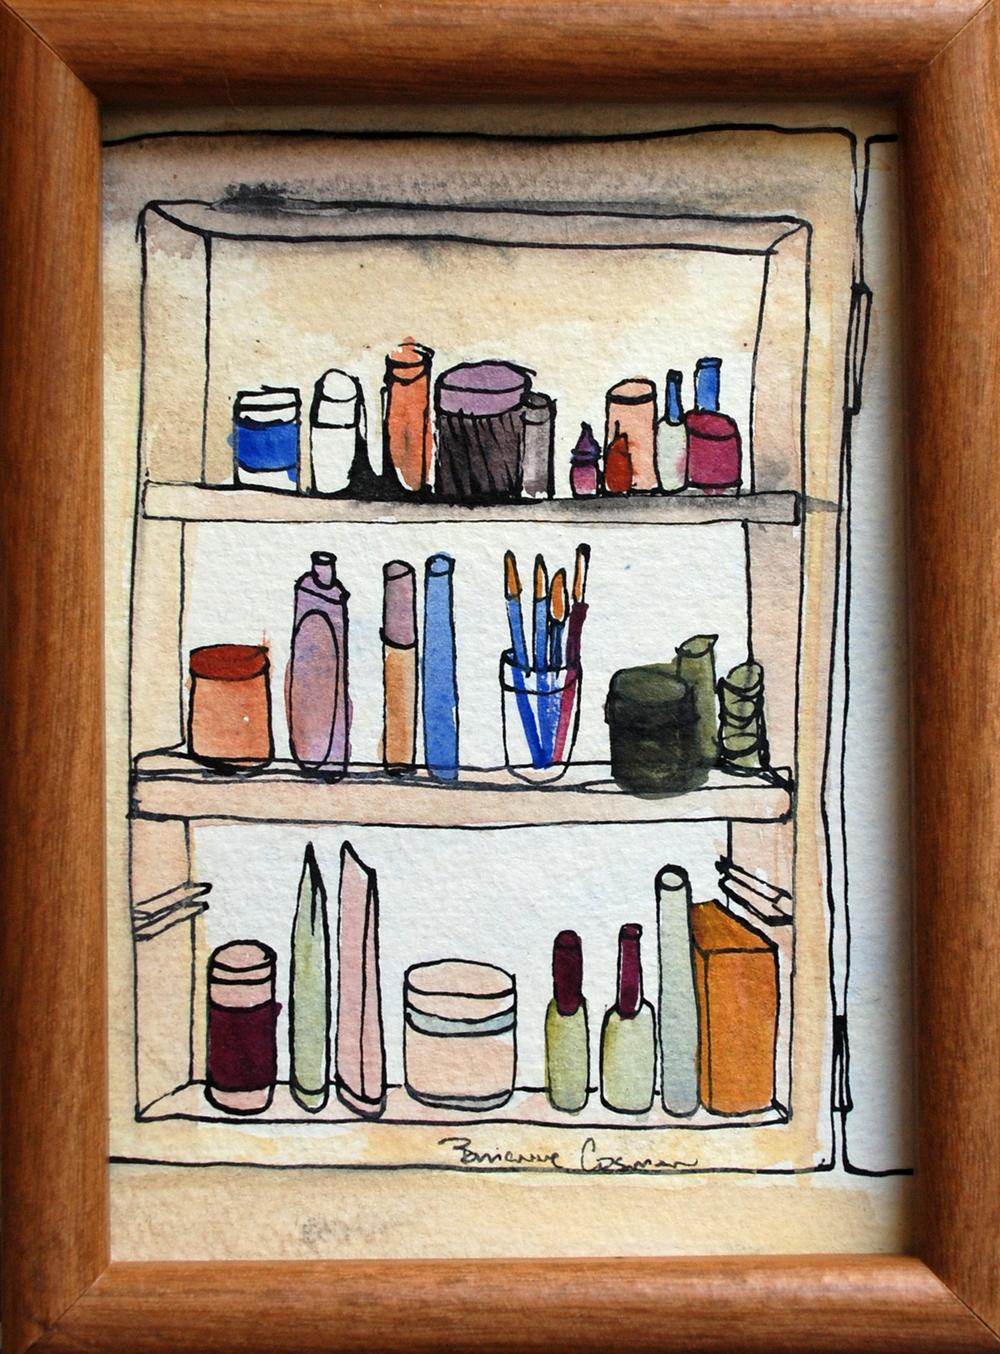 "51: Medicine Cabinet Clutter 5 x 7 """